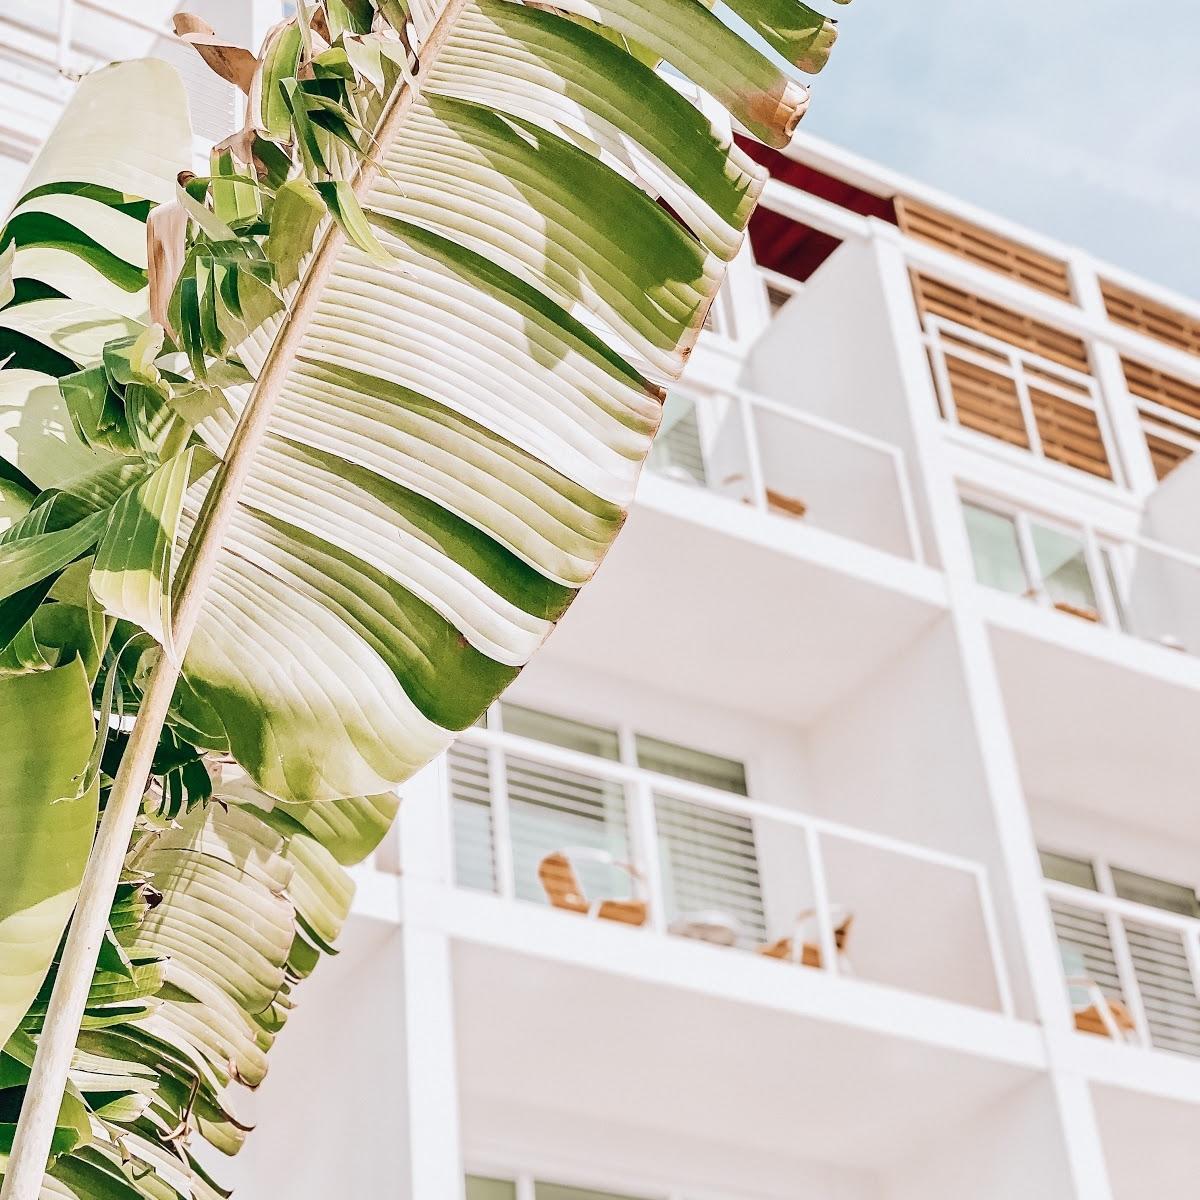 exterior view of balconies